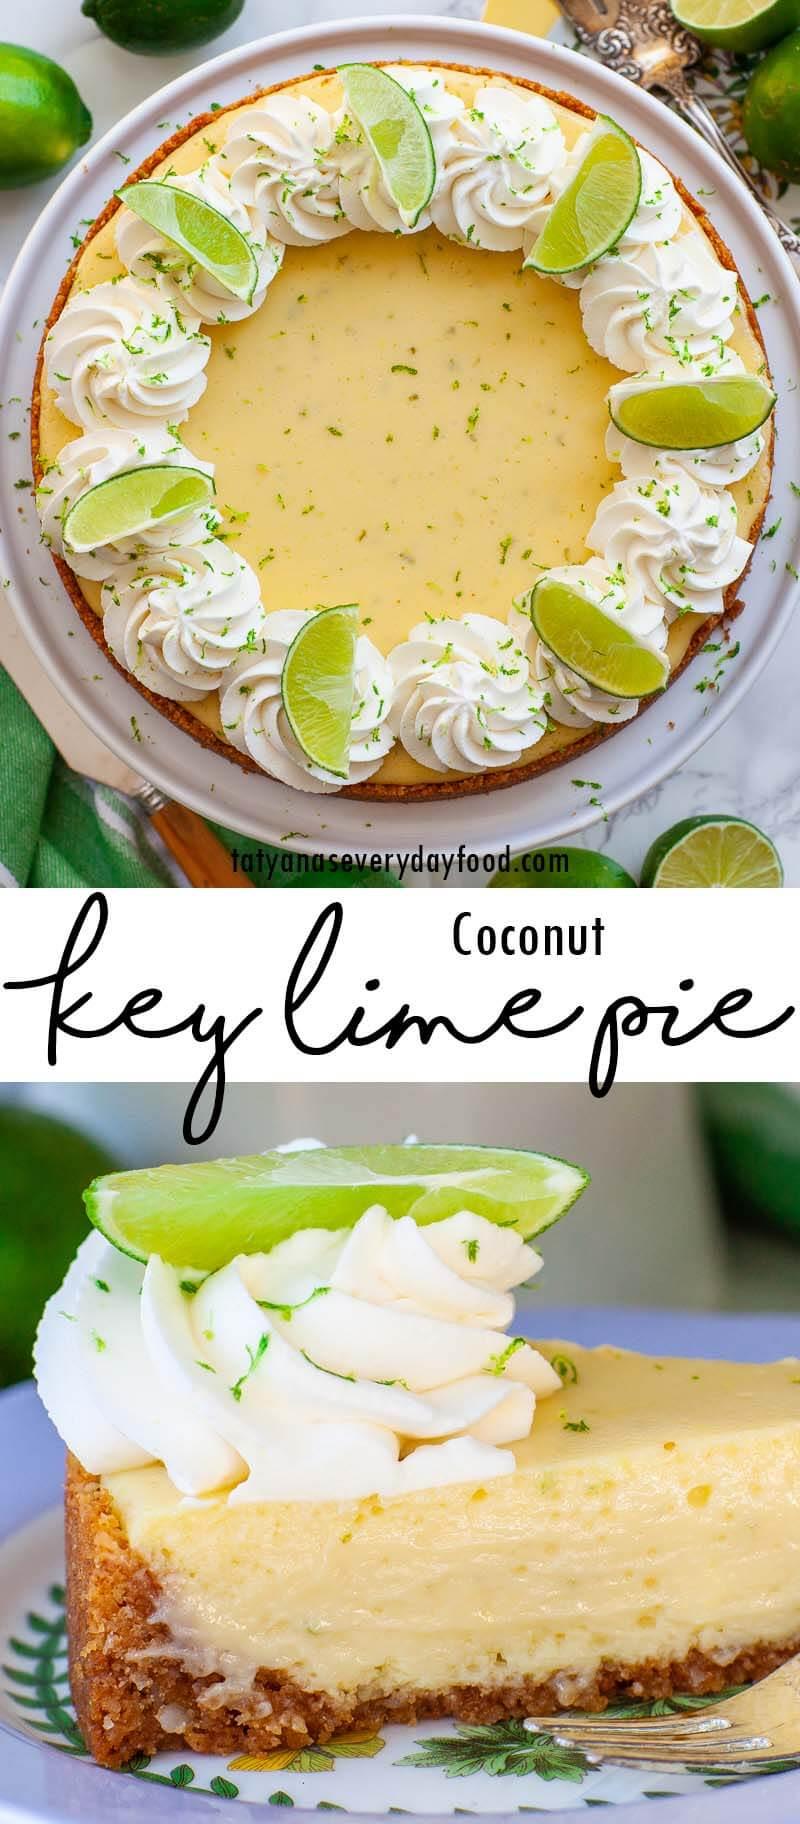 Coconut Key Lime Pie video recipe